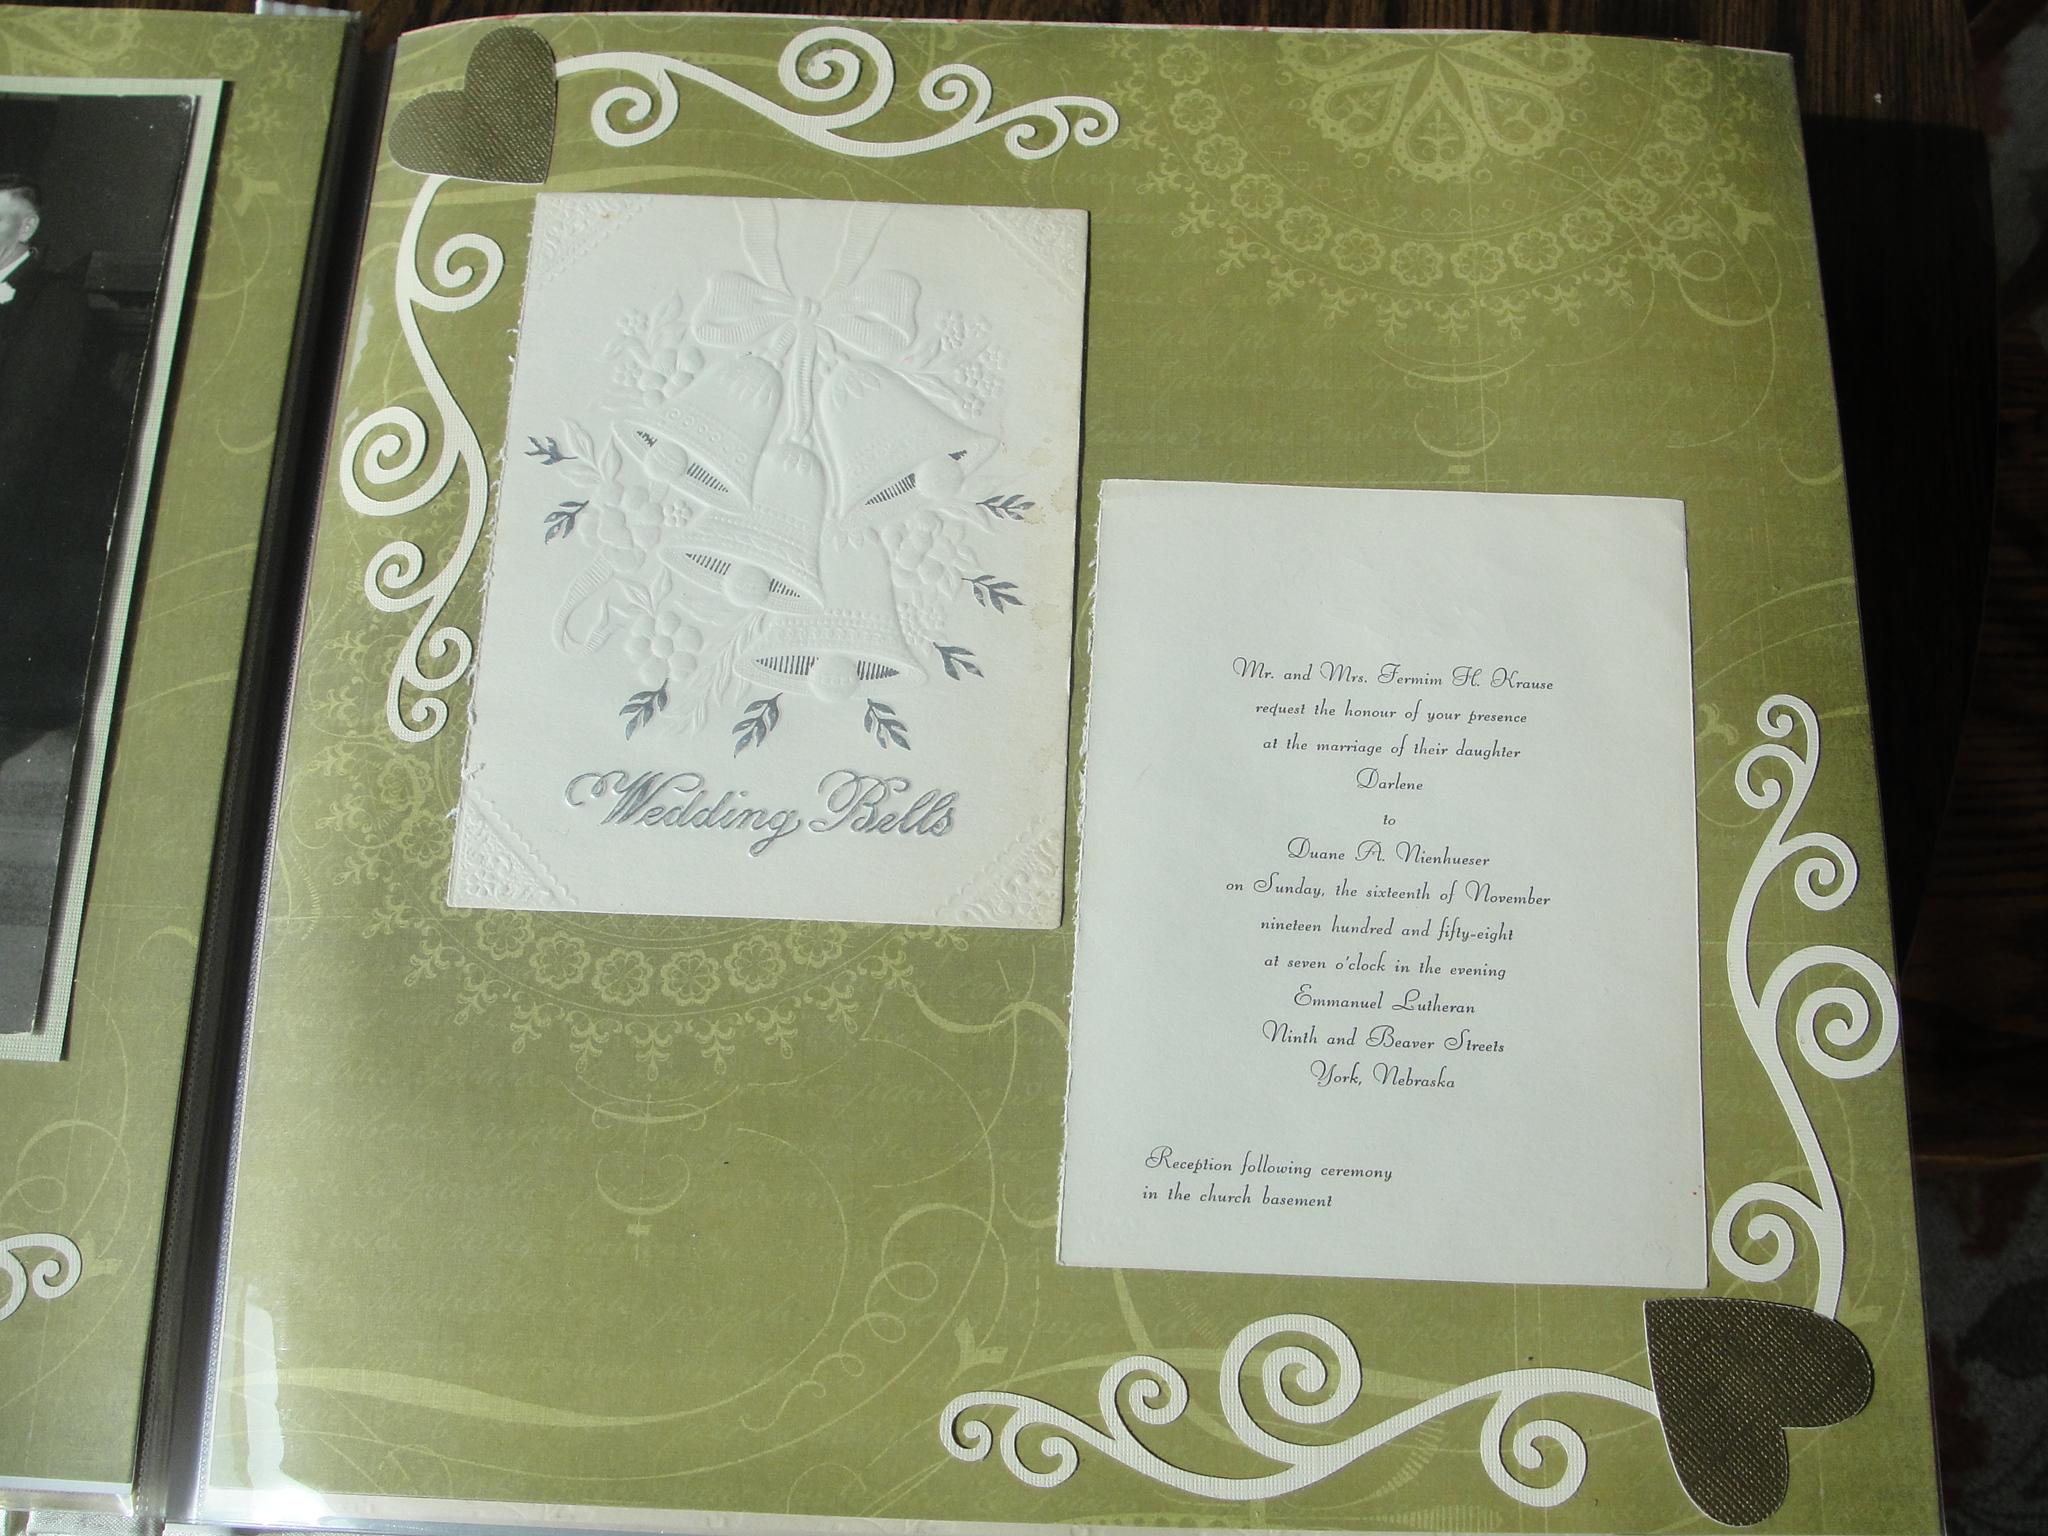 How to scrapbook a wedding invitation - Scrapbook Invitation Ideas Wedding Free Scrapbook Wedding Invitation Ideas